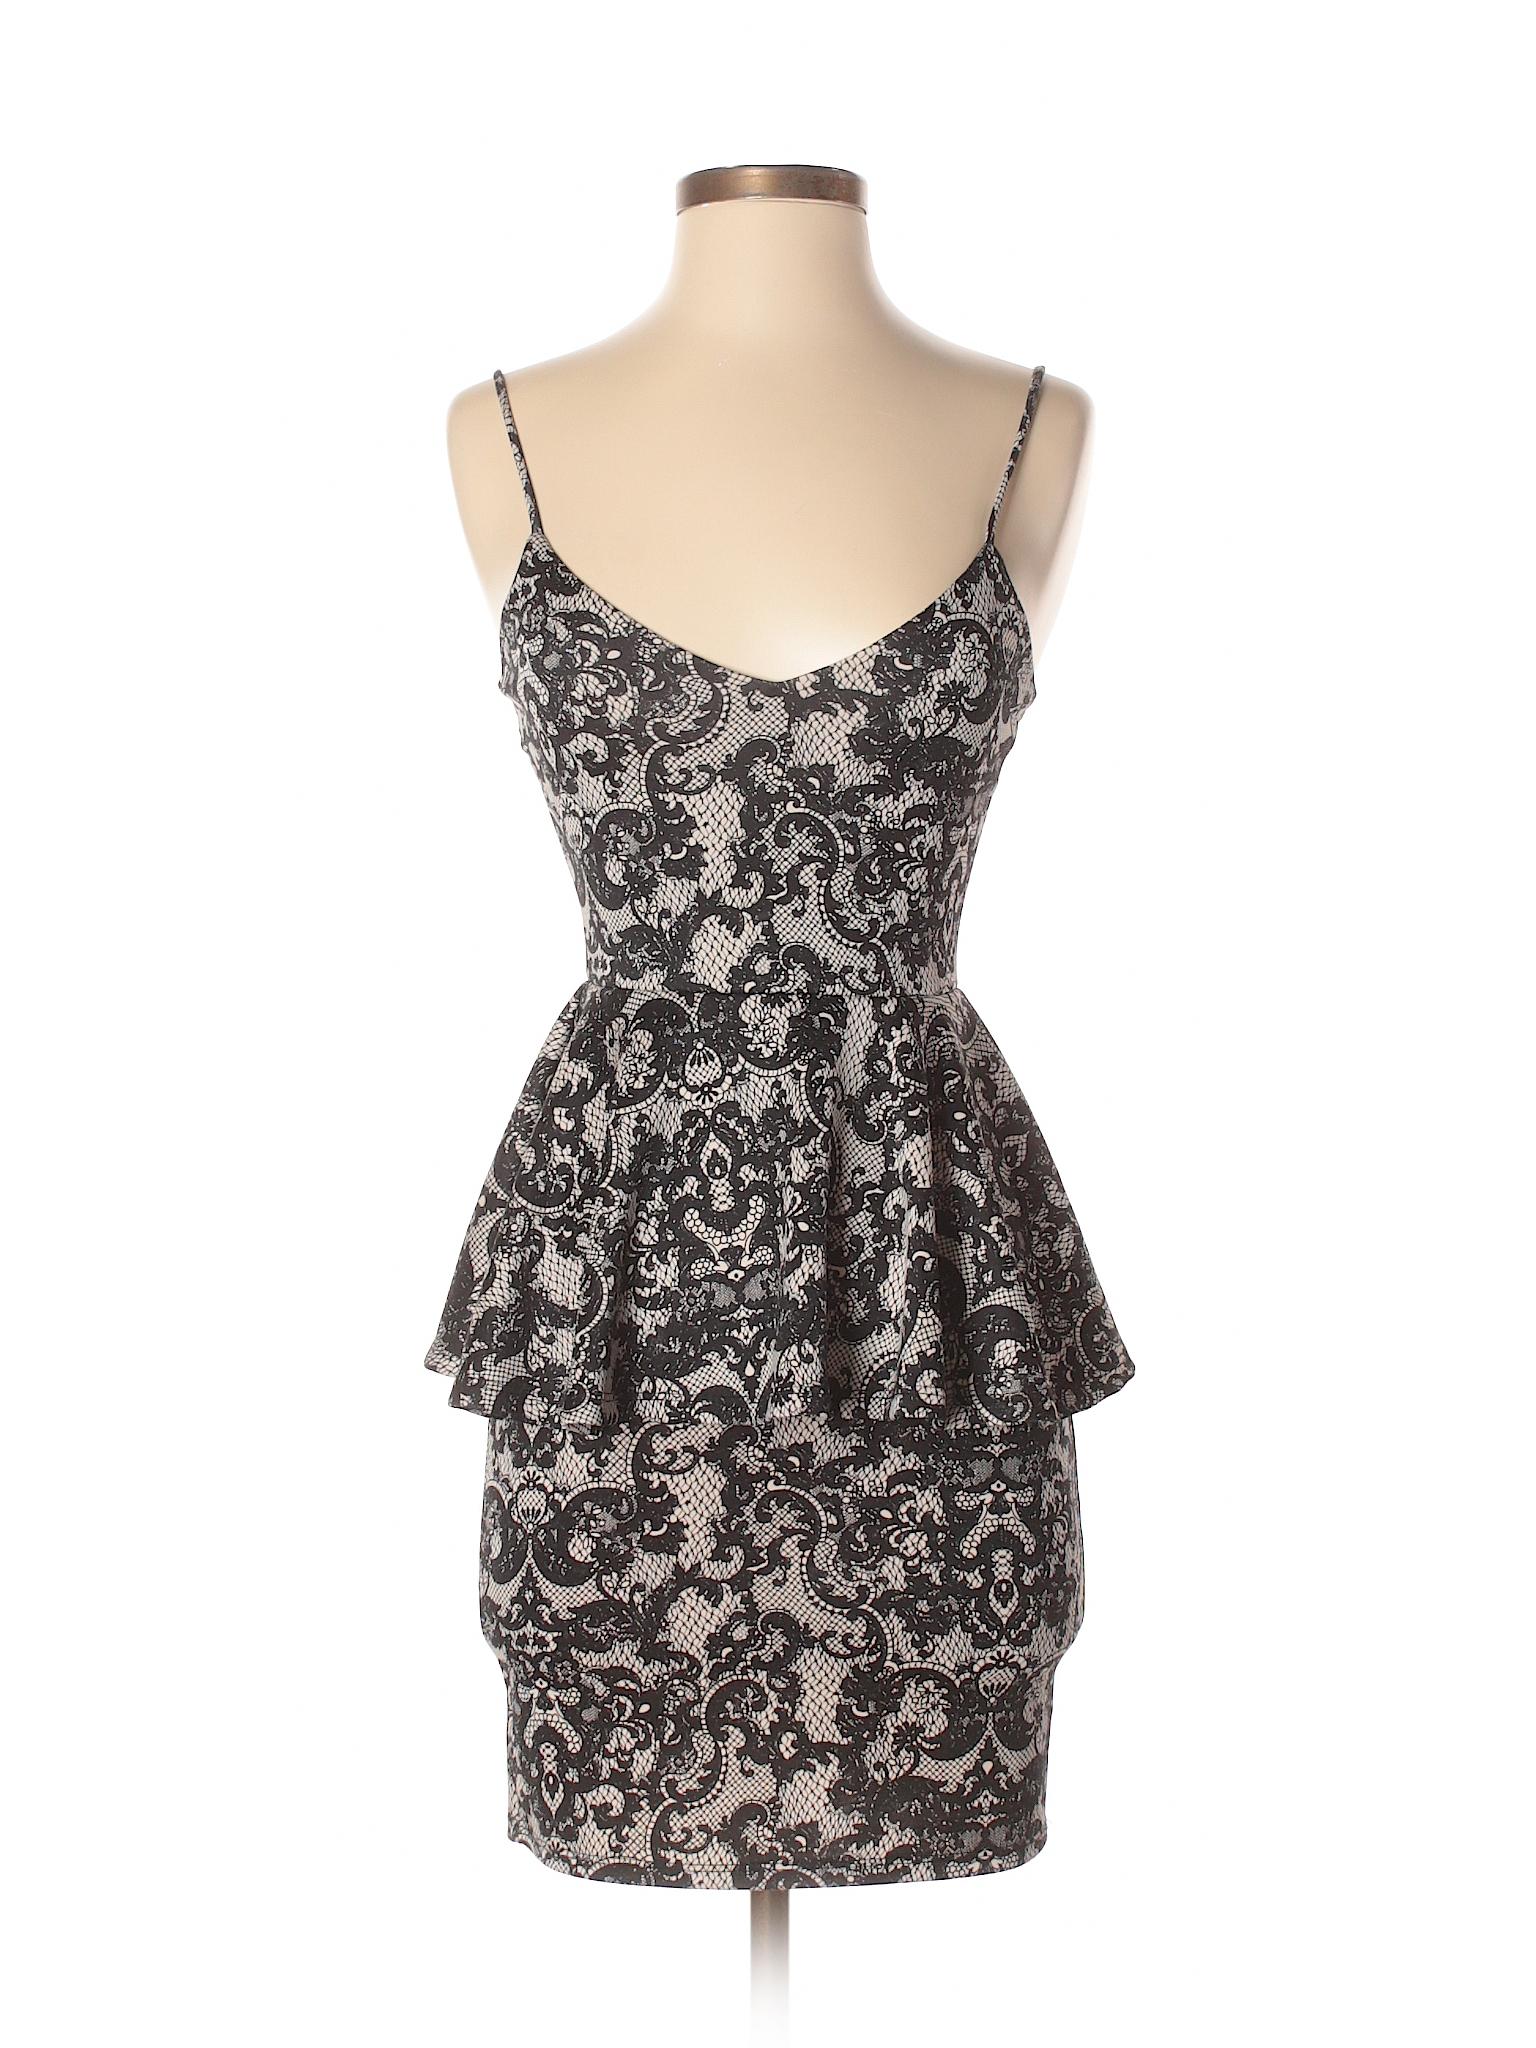 Boutique winter winter Casual Boutique Boutique Casual Dress Dress Shasa Shasa vxa1q6w1